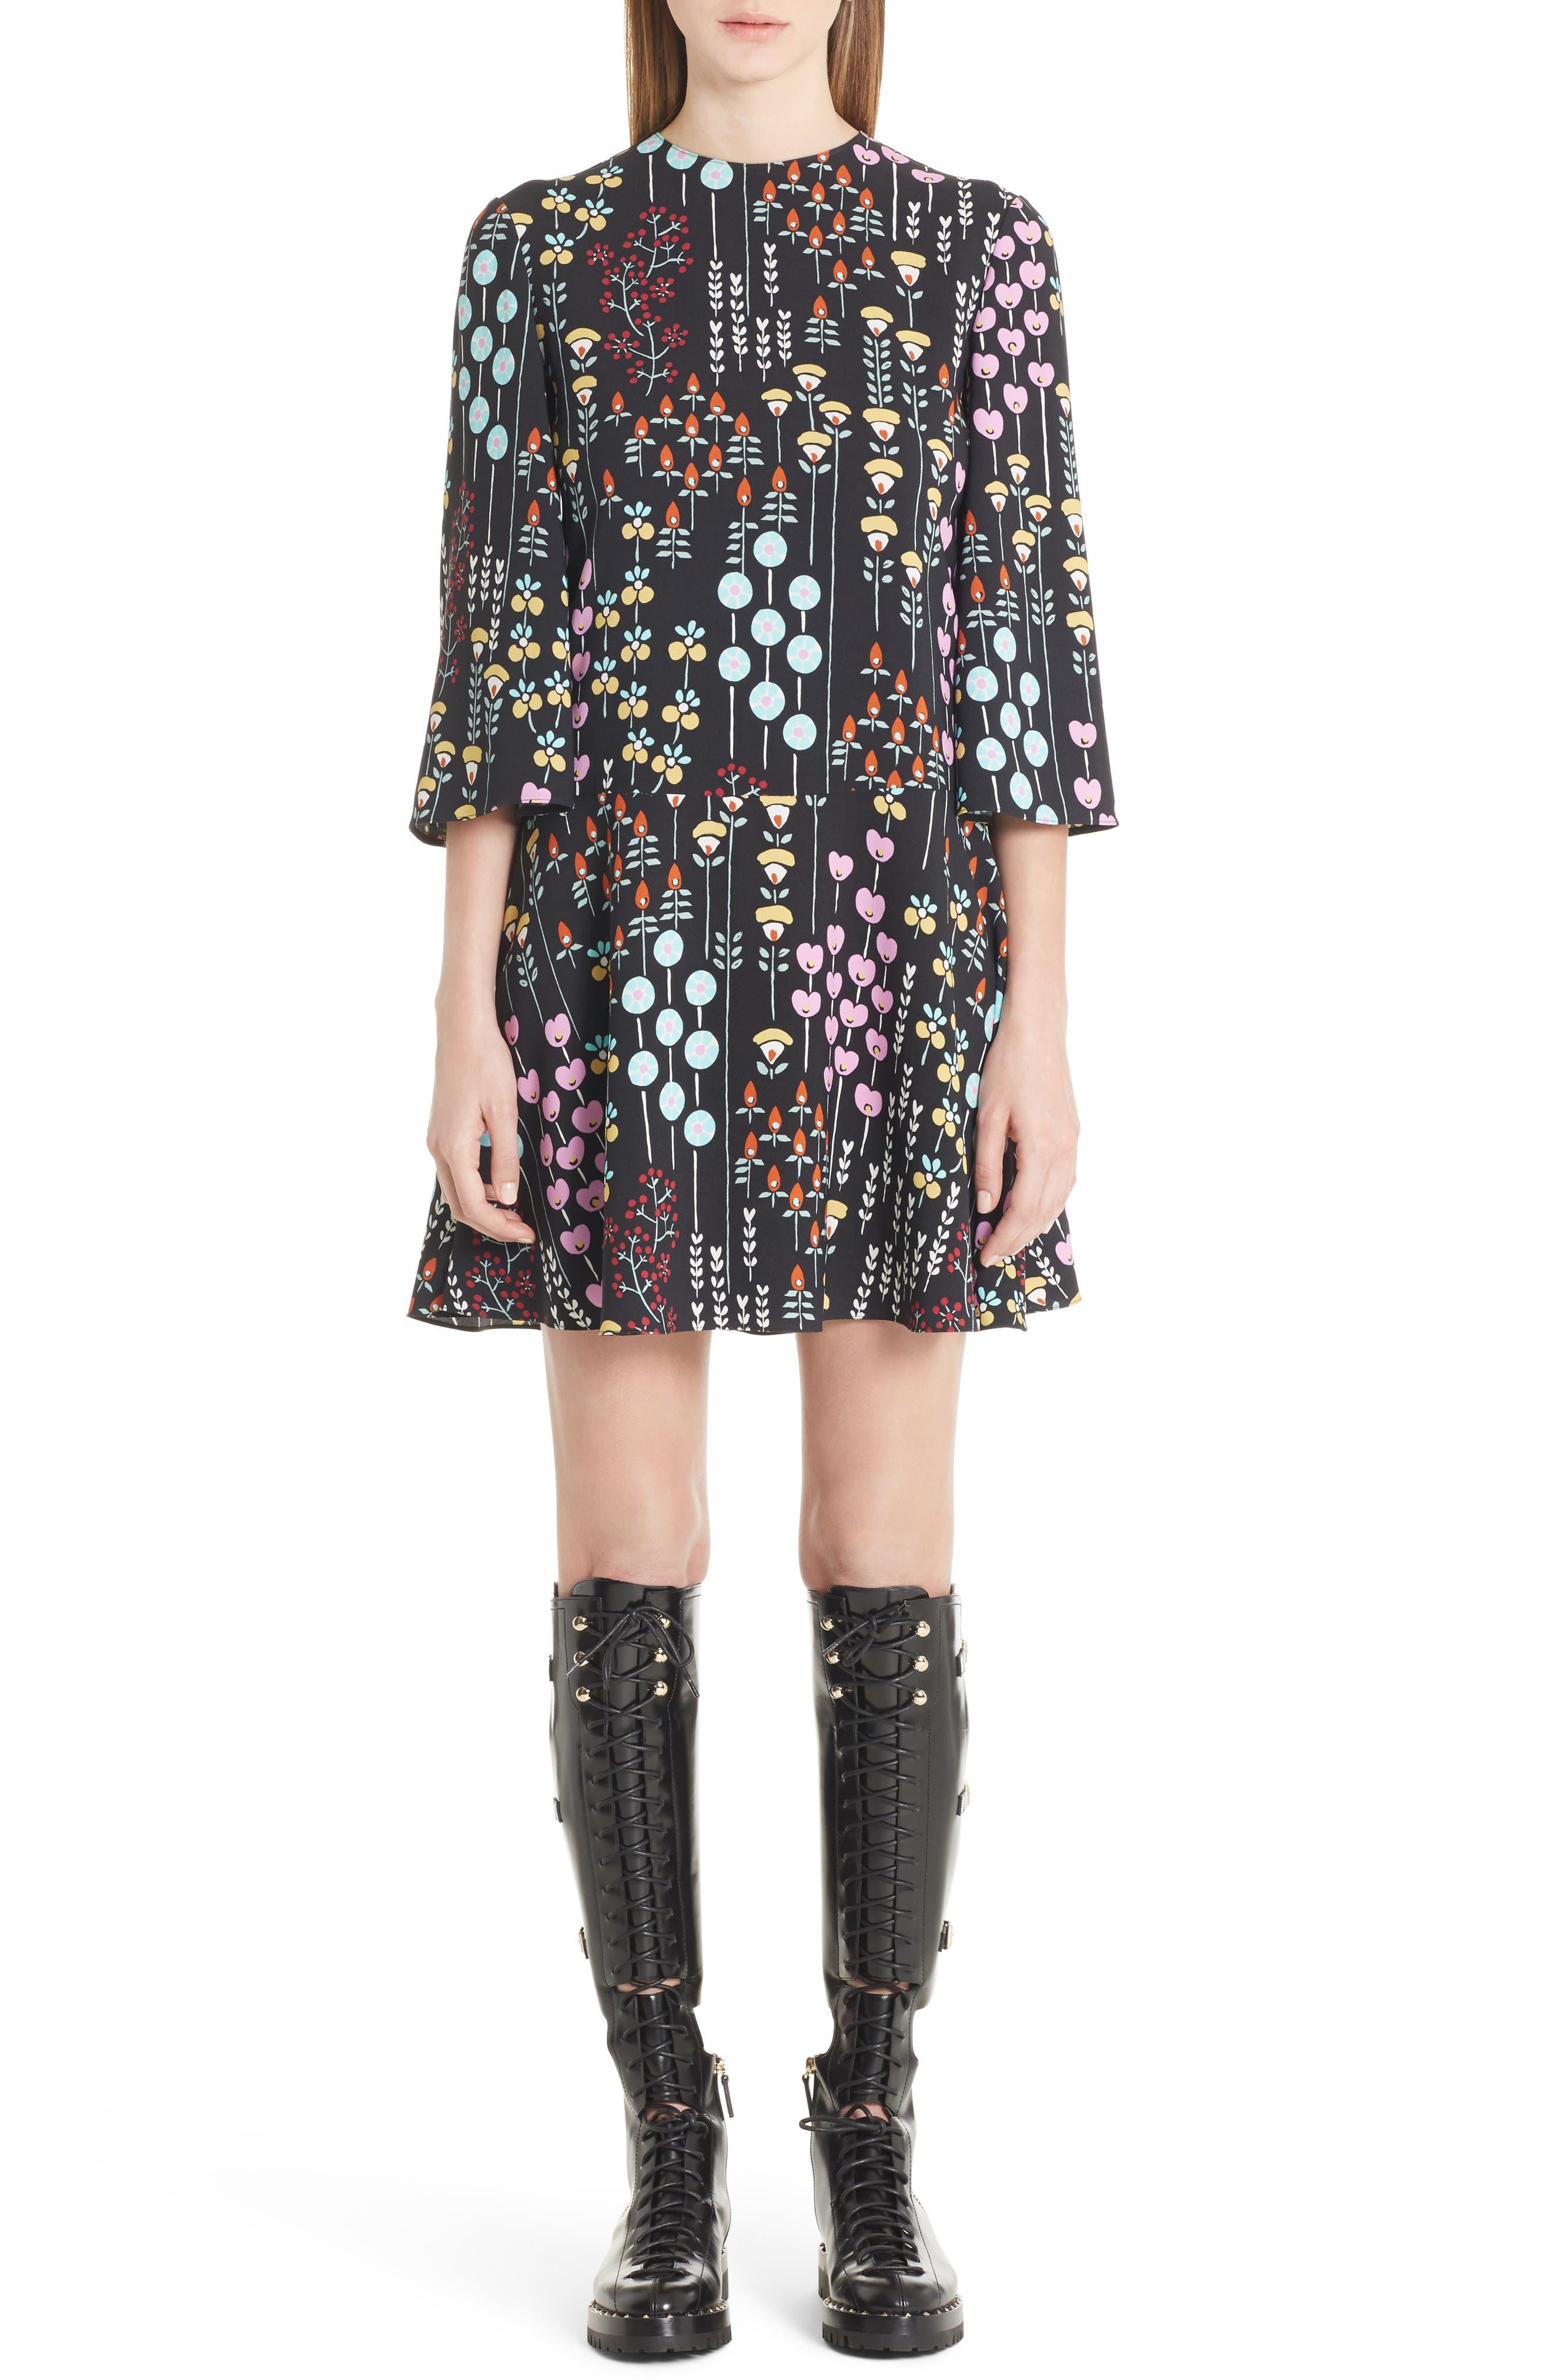 VALENTINO GARAVANI Valentino Floral Stem Print Dress